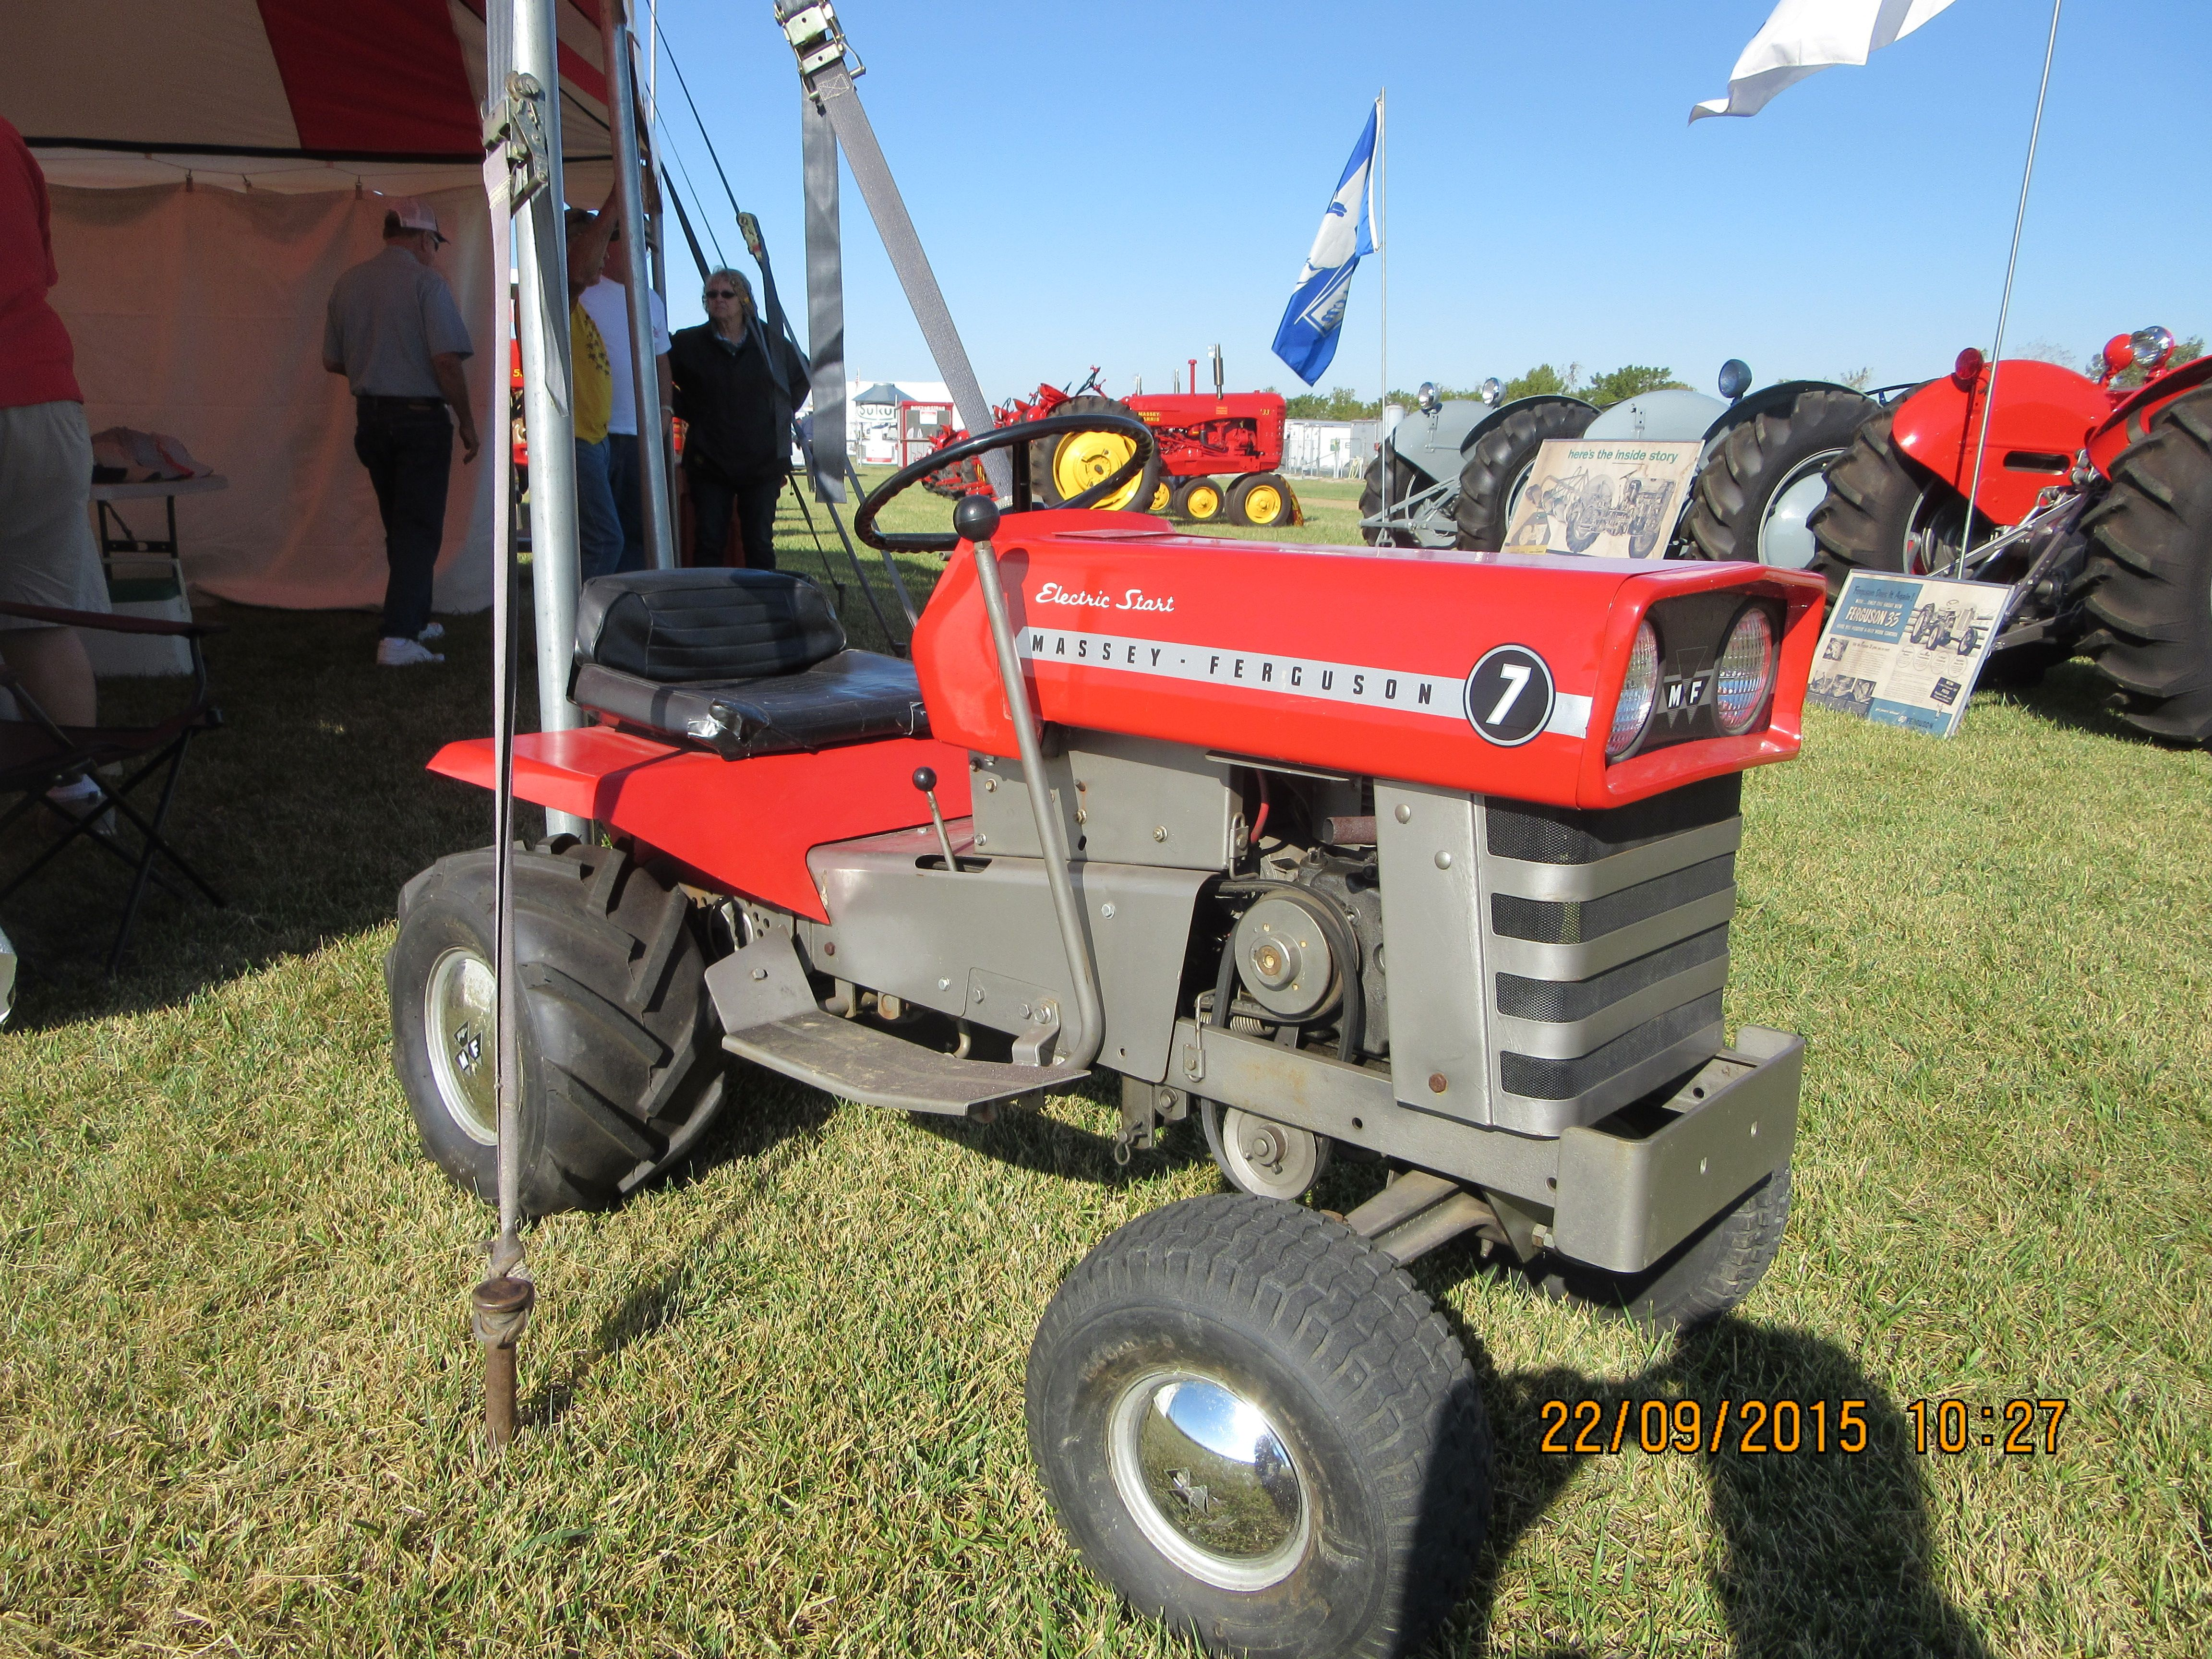 Massey Ferguson Yard Tractors : Massey ferguson lawn garden tractor